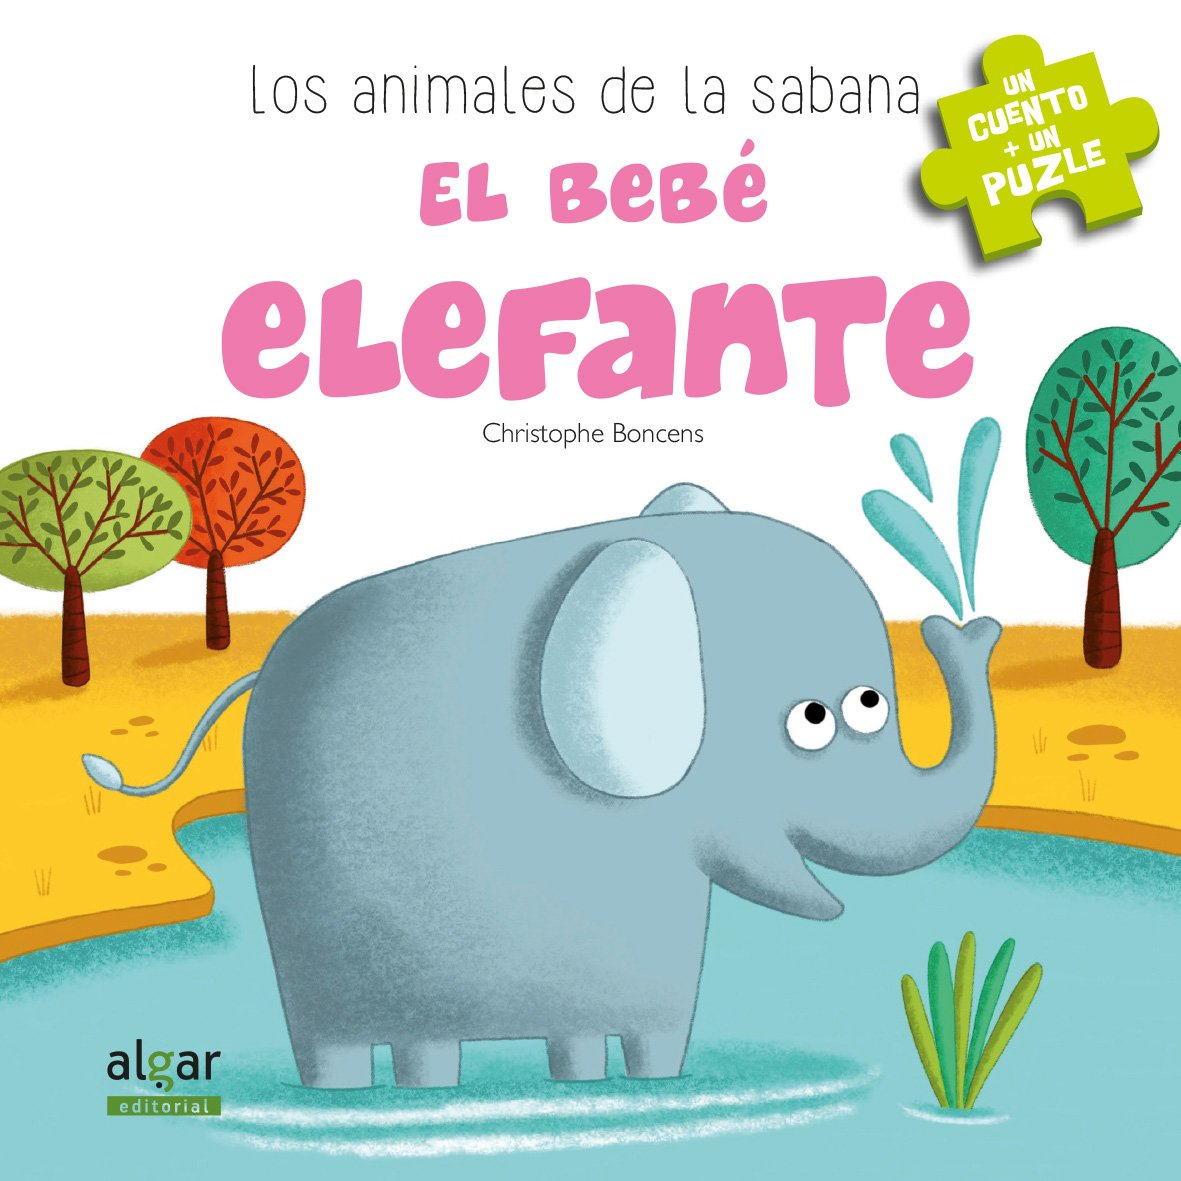 492814f97a2 ANIMALES DE LA SABANA BEBE ELEFANTE: Christophe Boncens ...